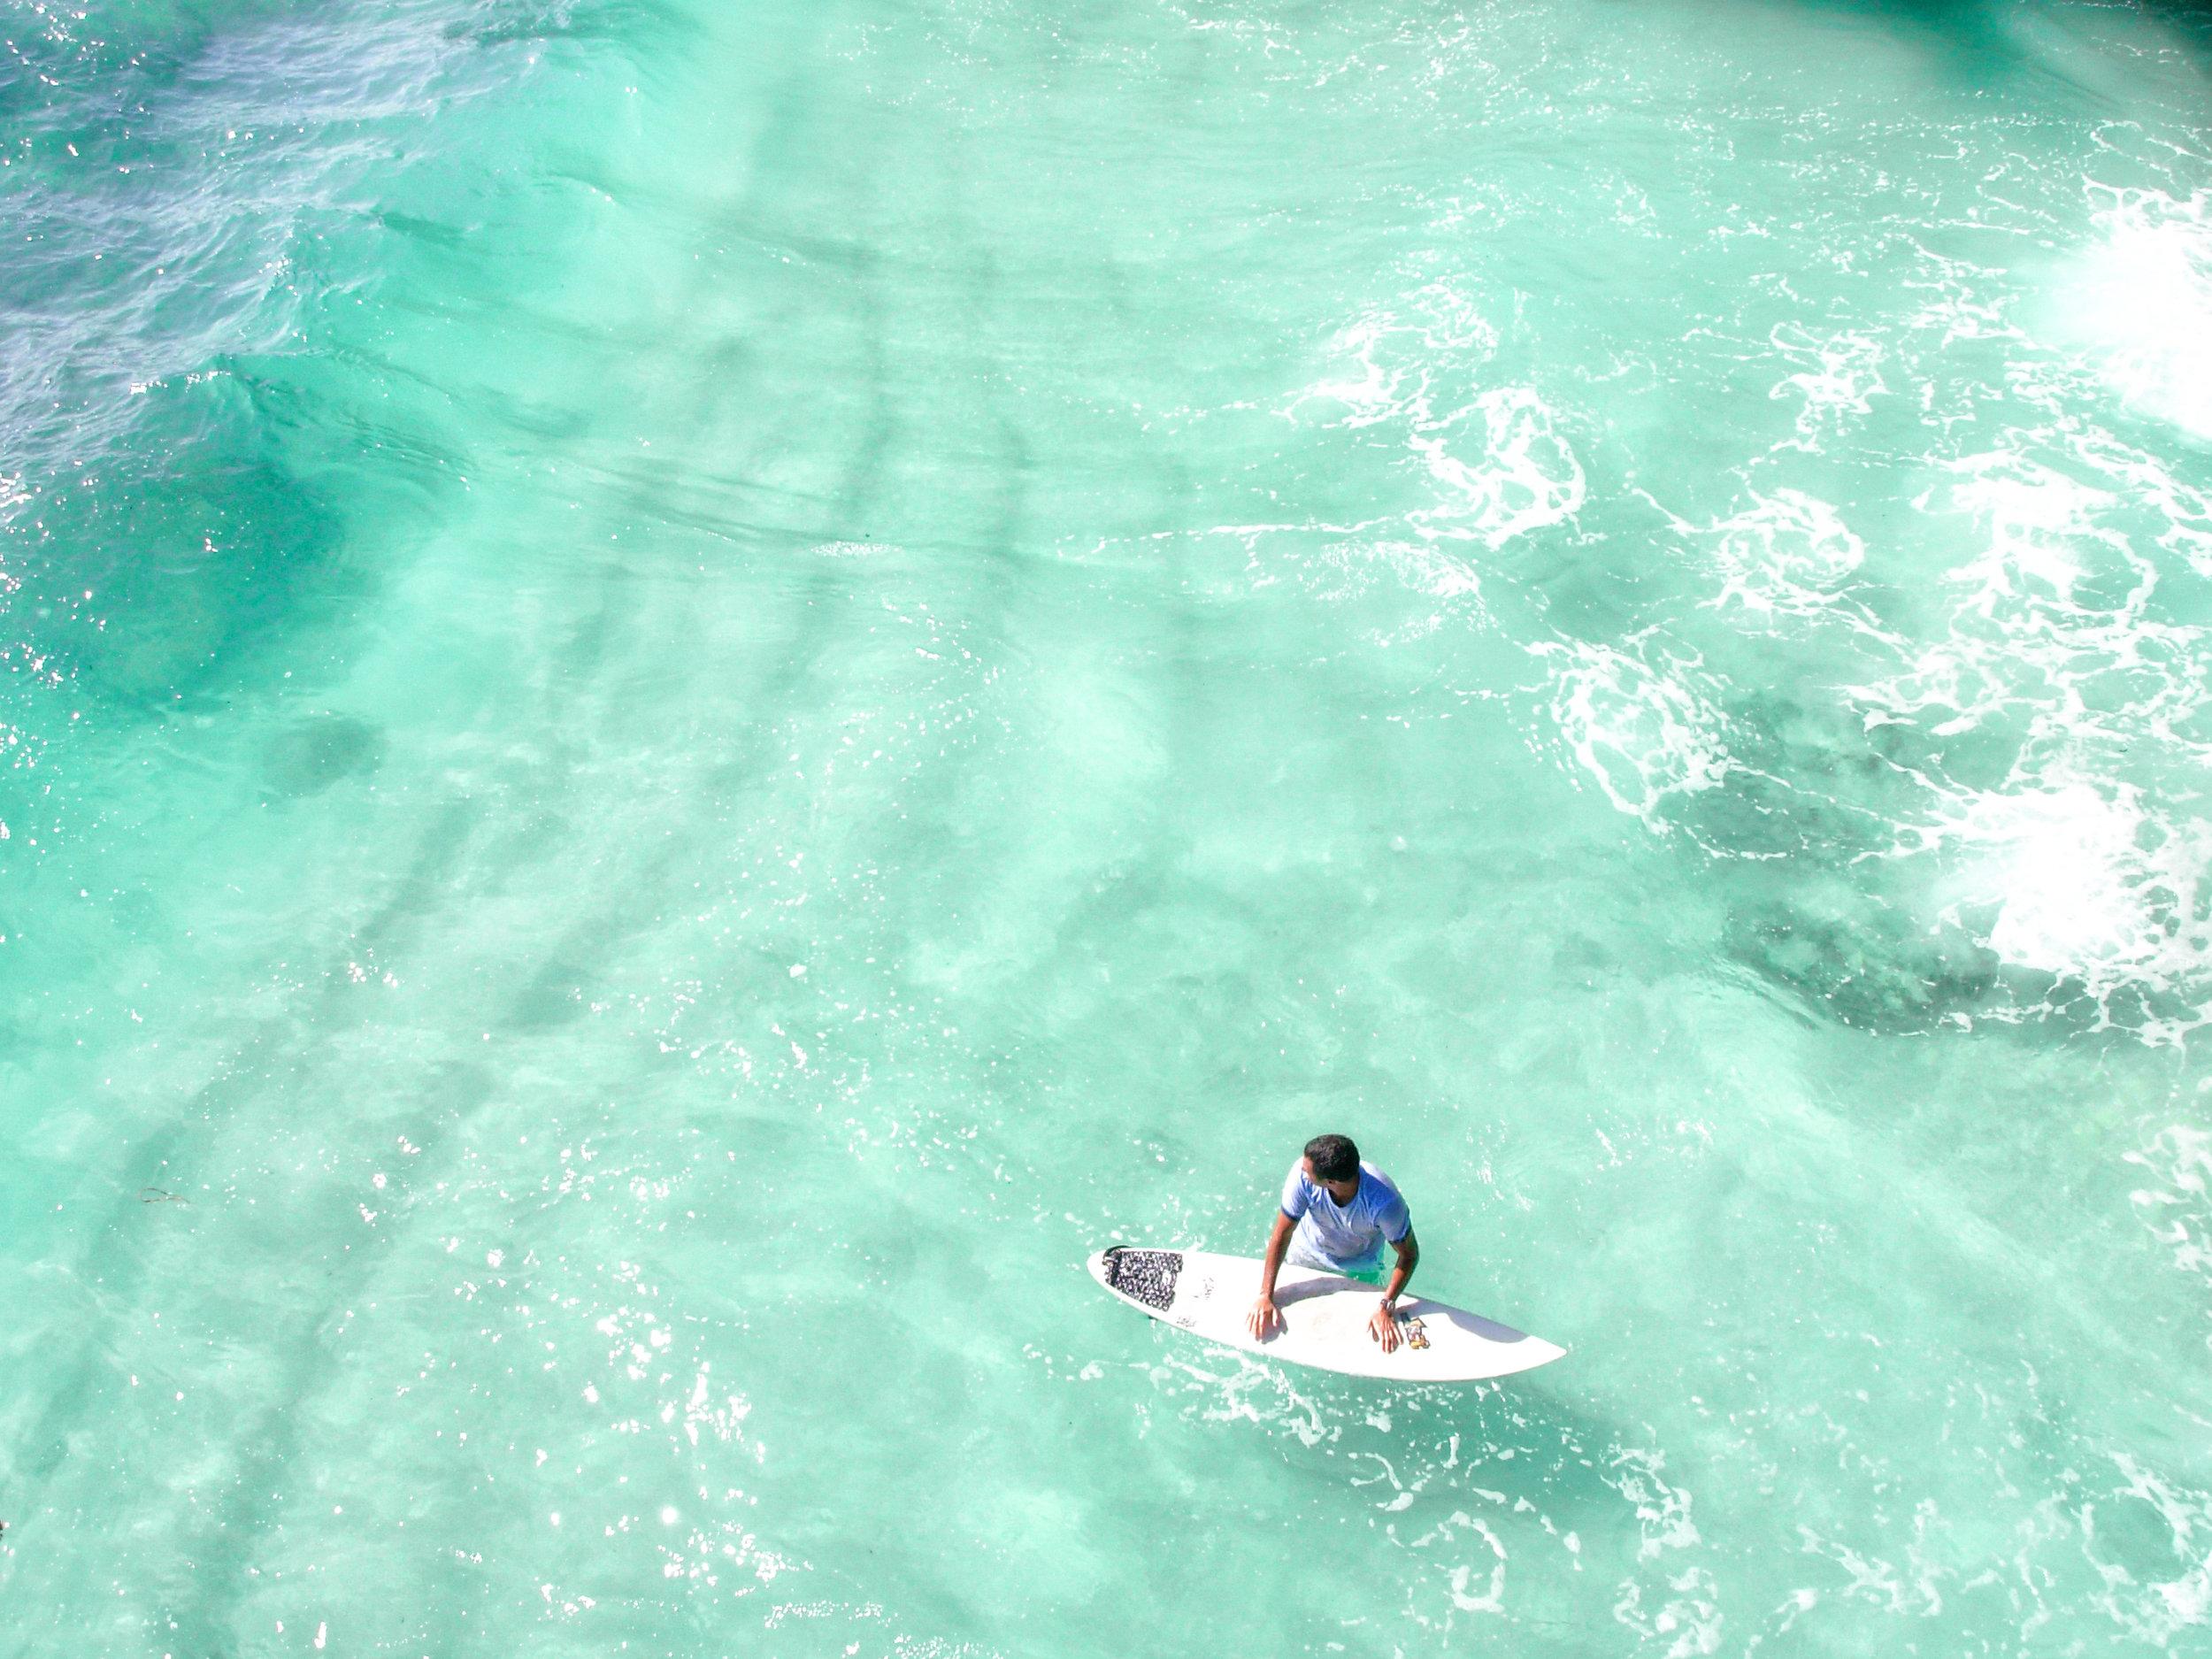 Bali Surfer.jpg